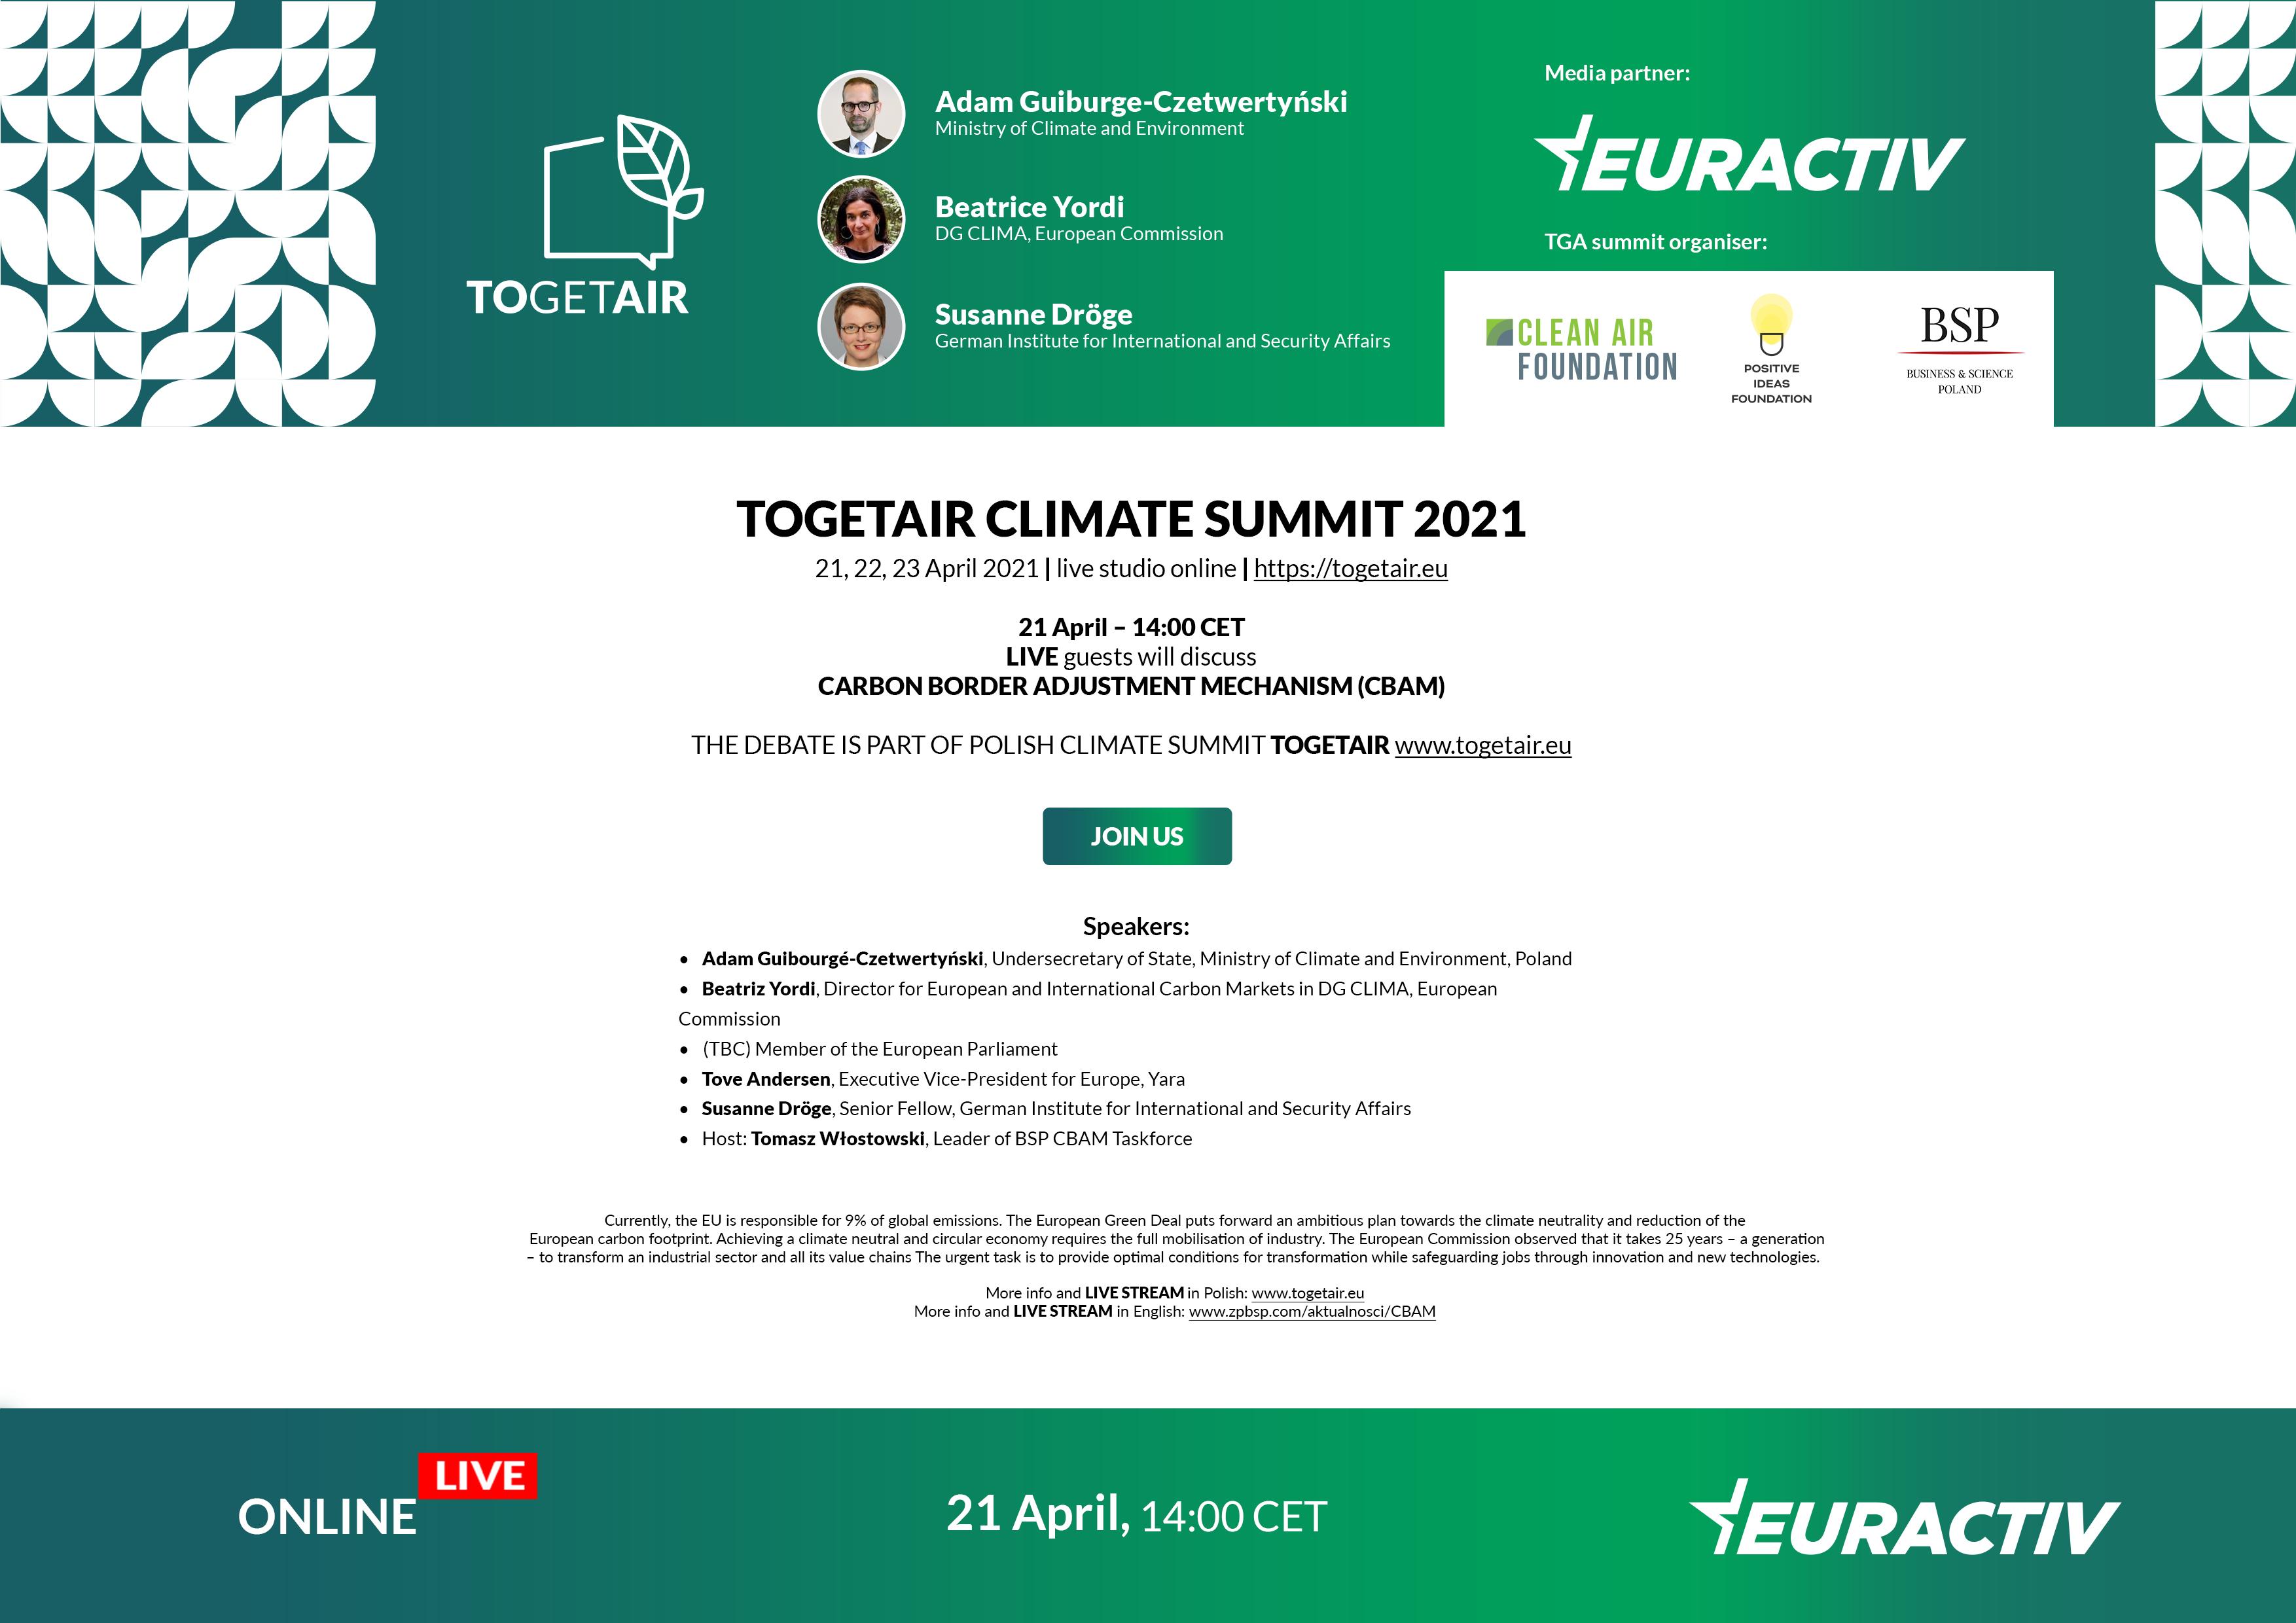 Media Partnership: TOGETAIR Climate Summit 2021